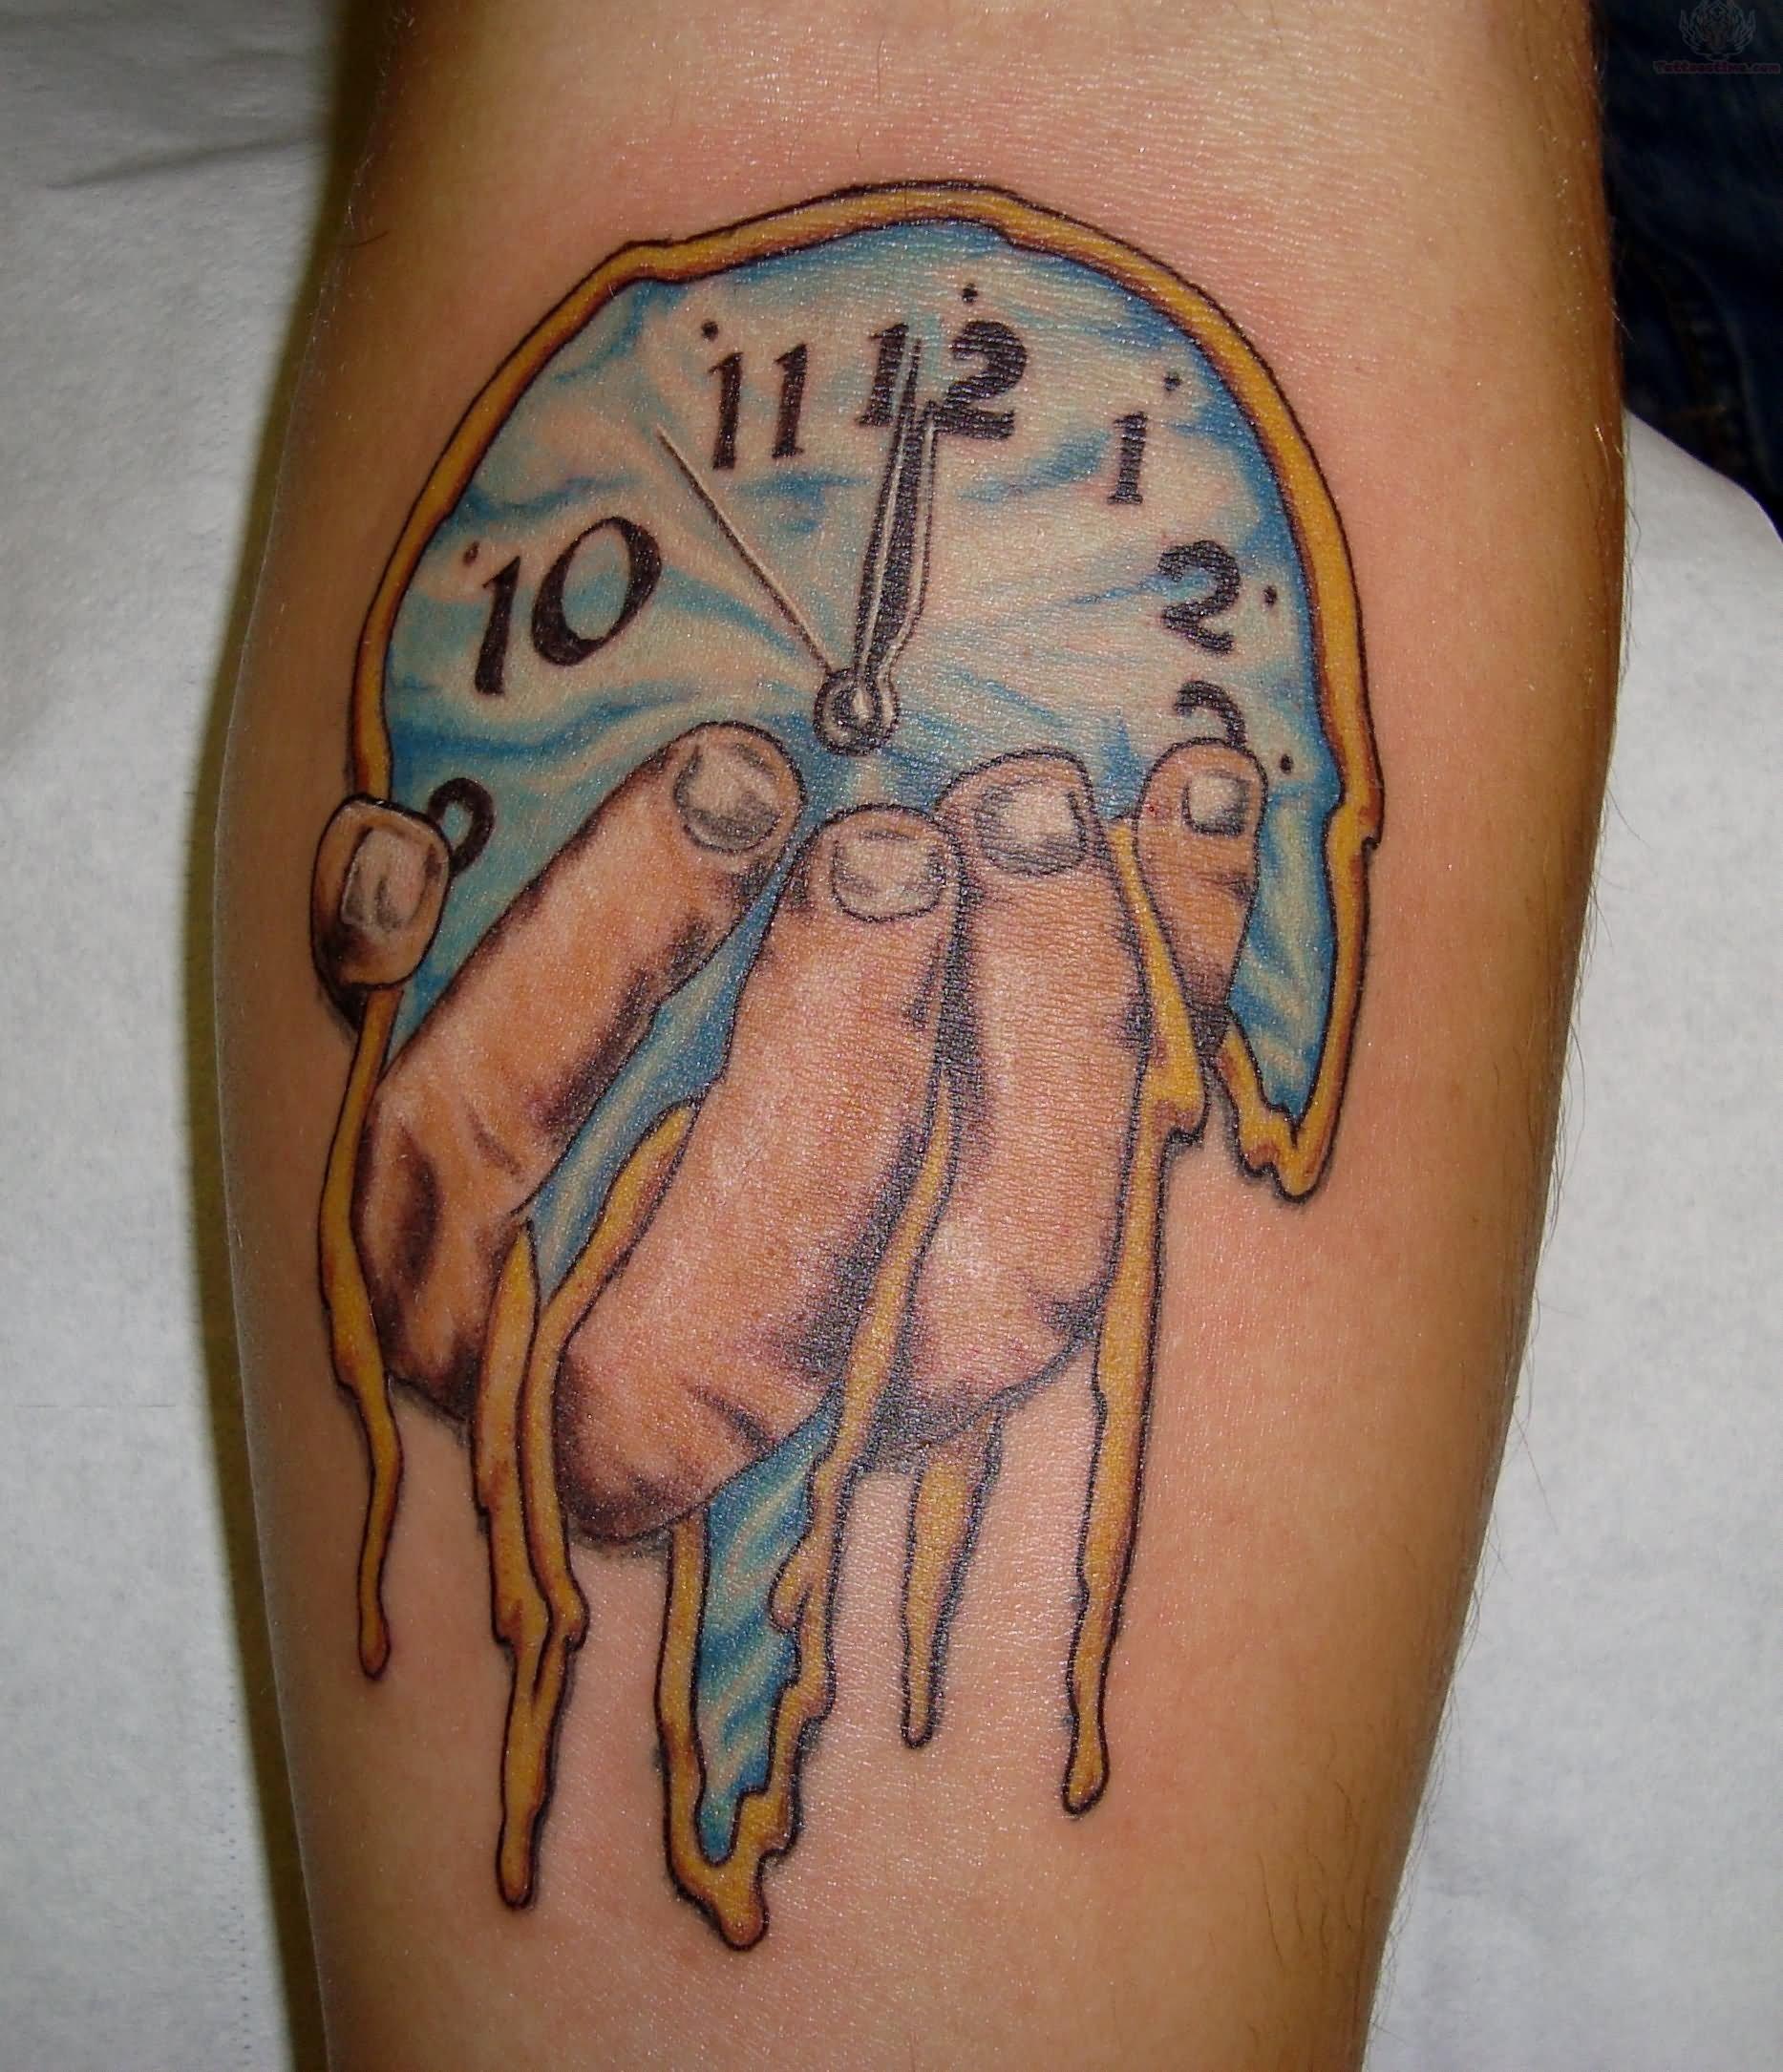 Pics Photos - M... Melting Clock Tattoo Designs